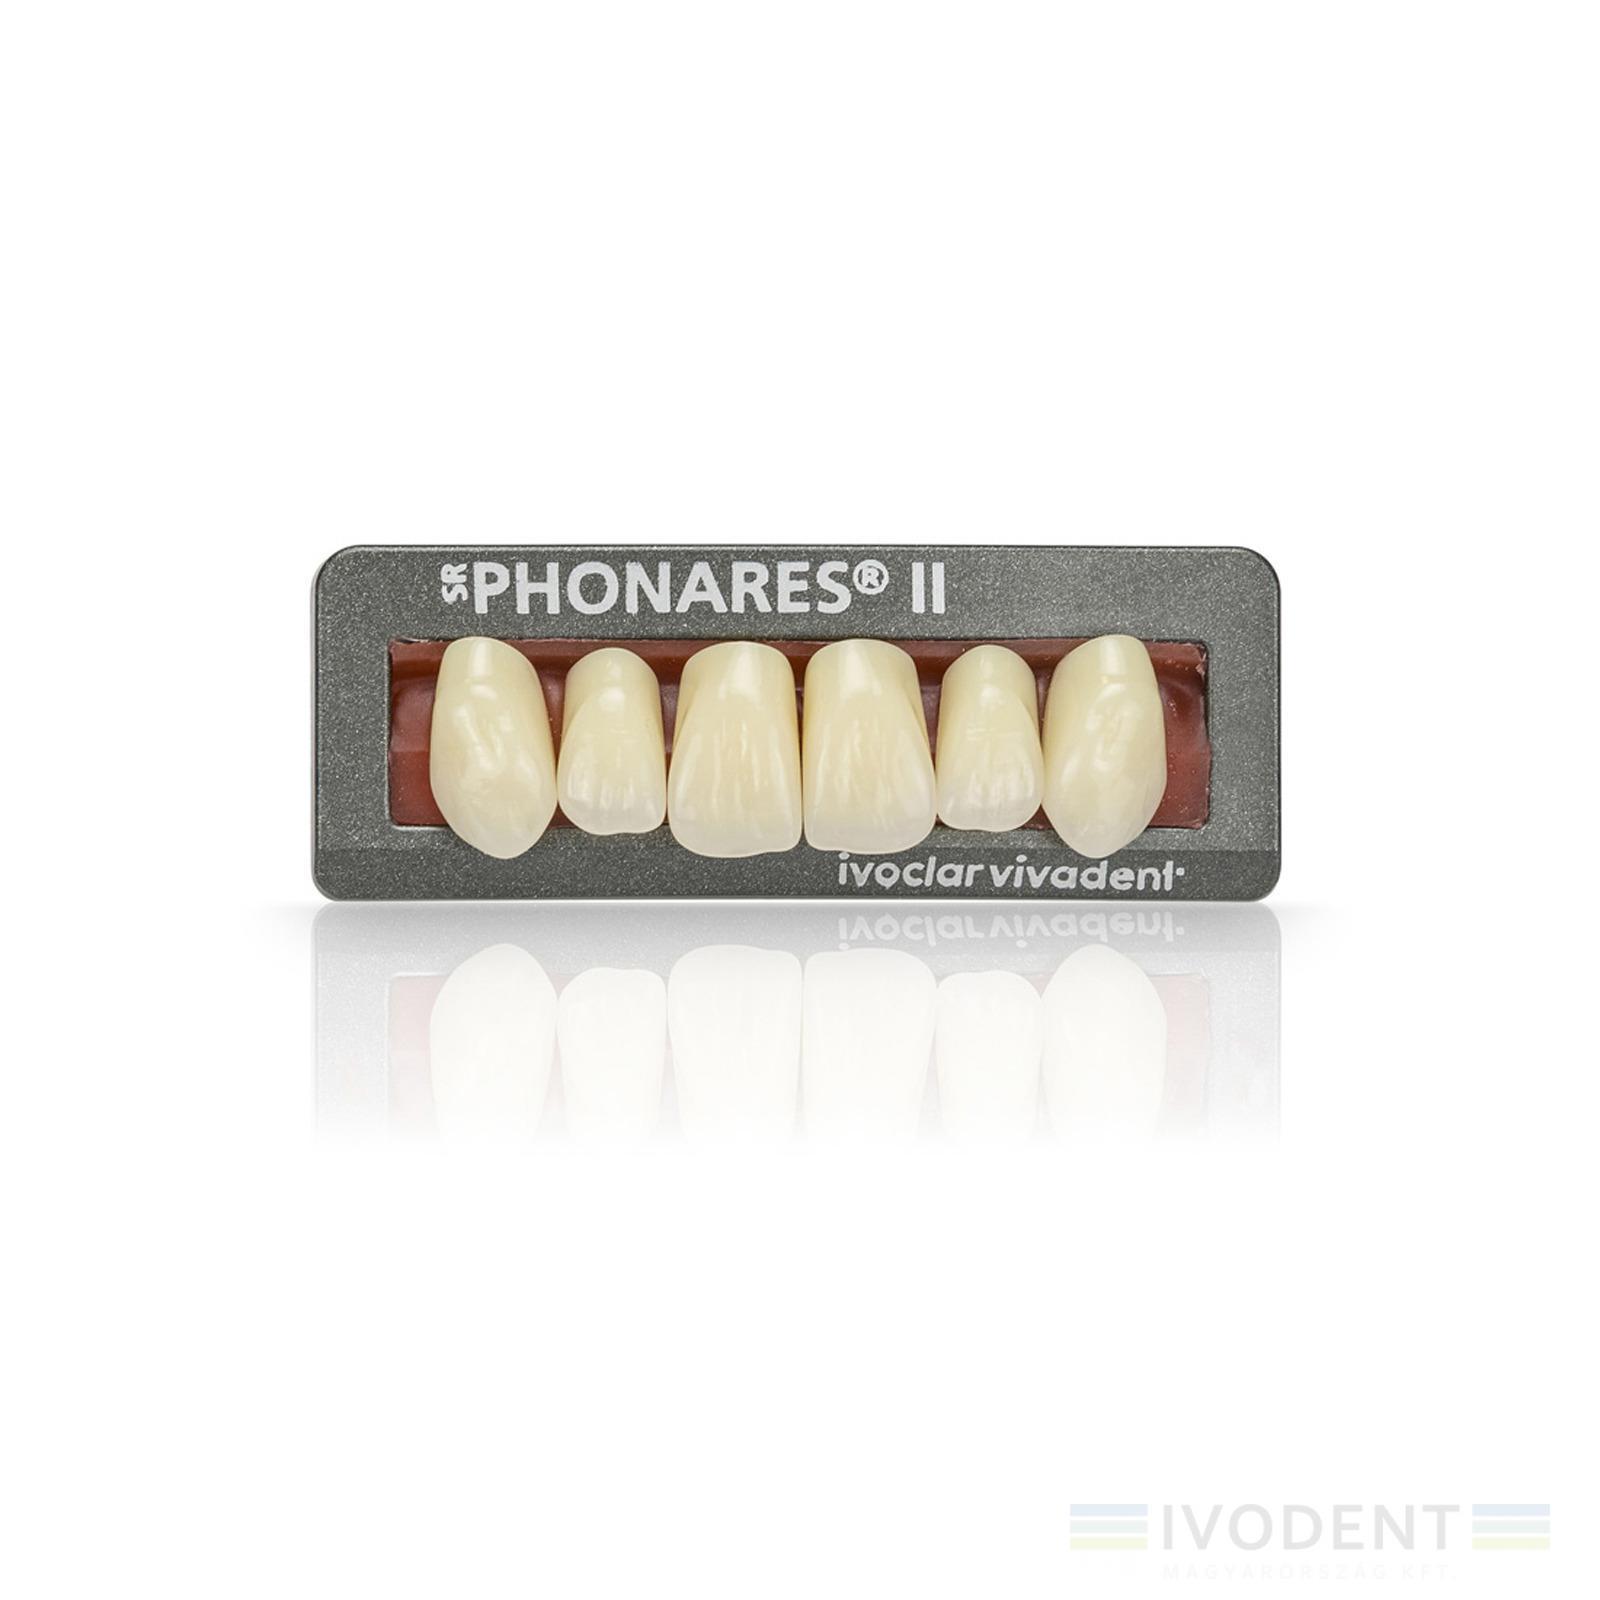 SR Phonares II Ant. set of 6